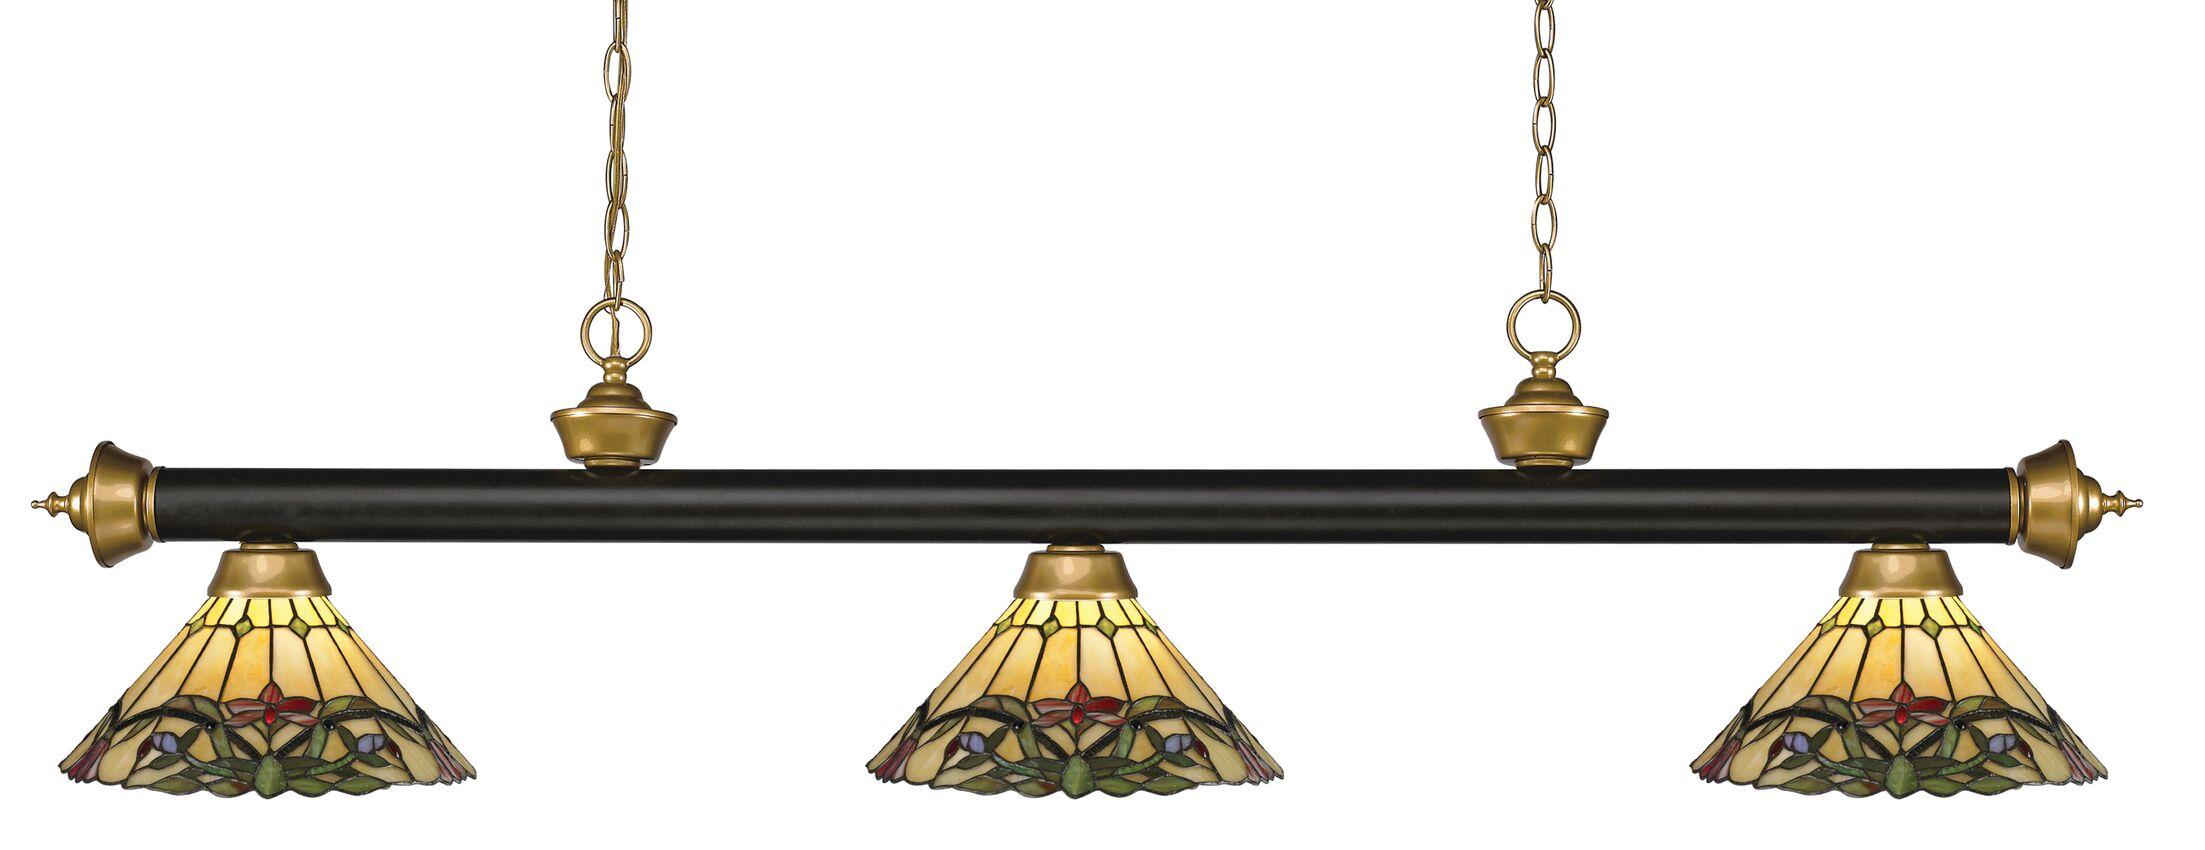 Billington 3-Light Pool Table Light